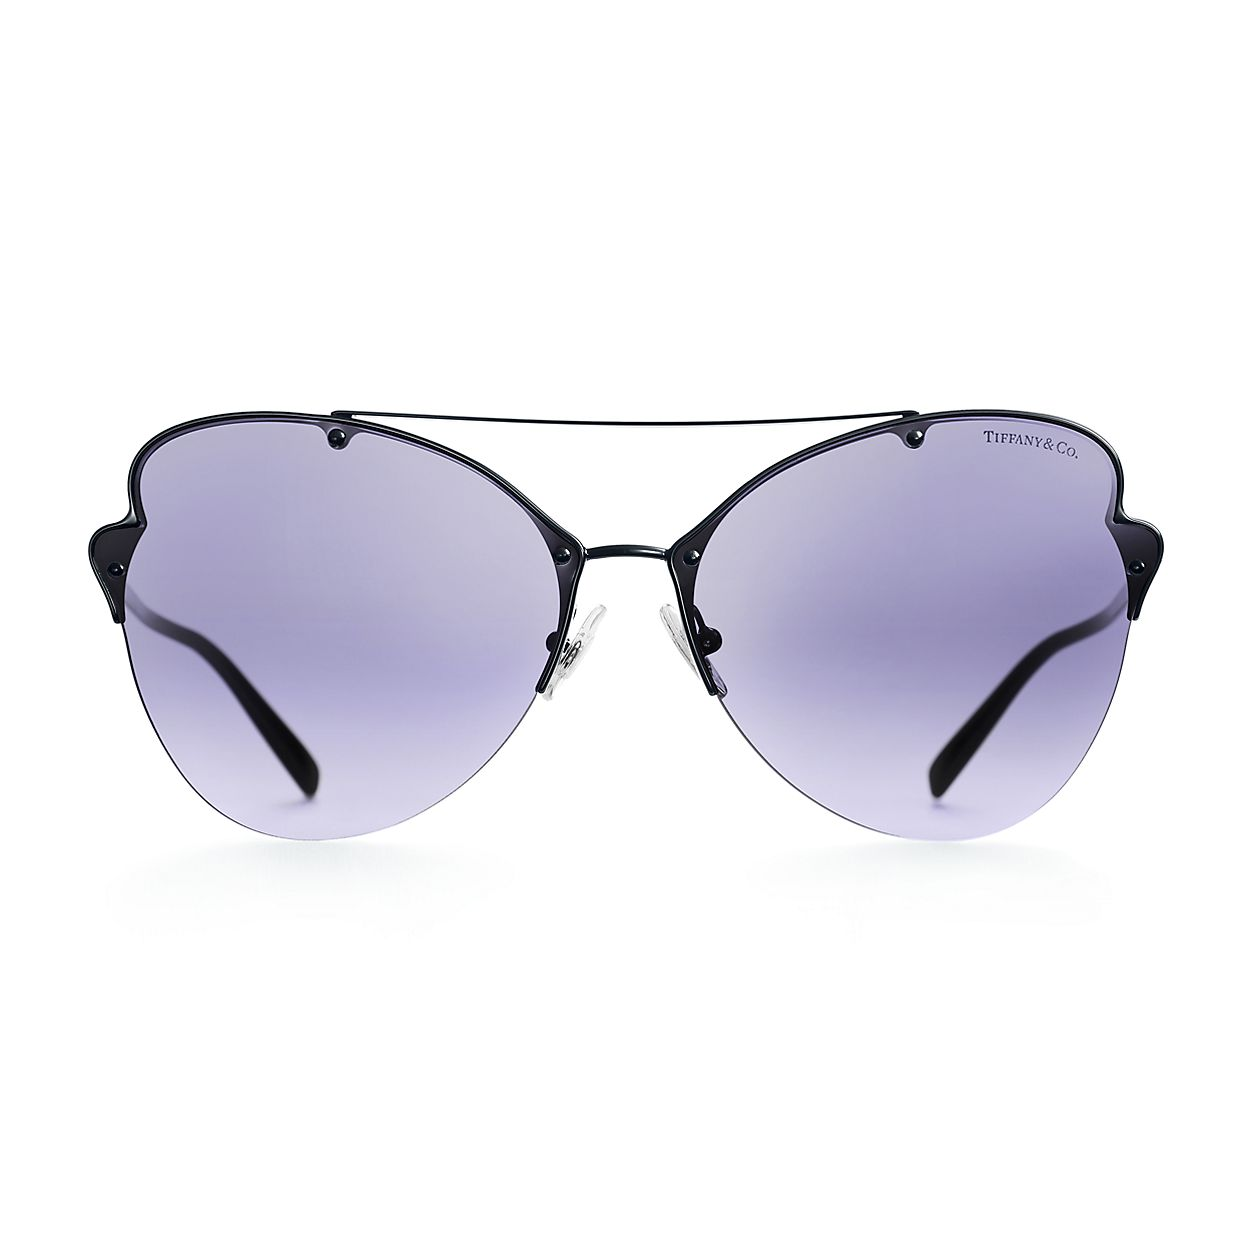 9e2d9b8321ca Tiffany Paper Flowers butterfly sunglasses in black metal.